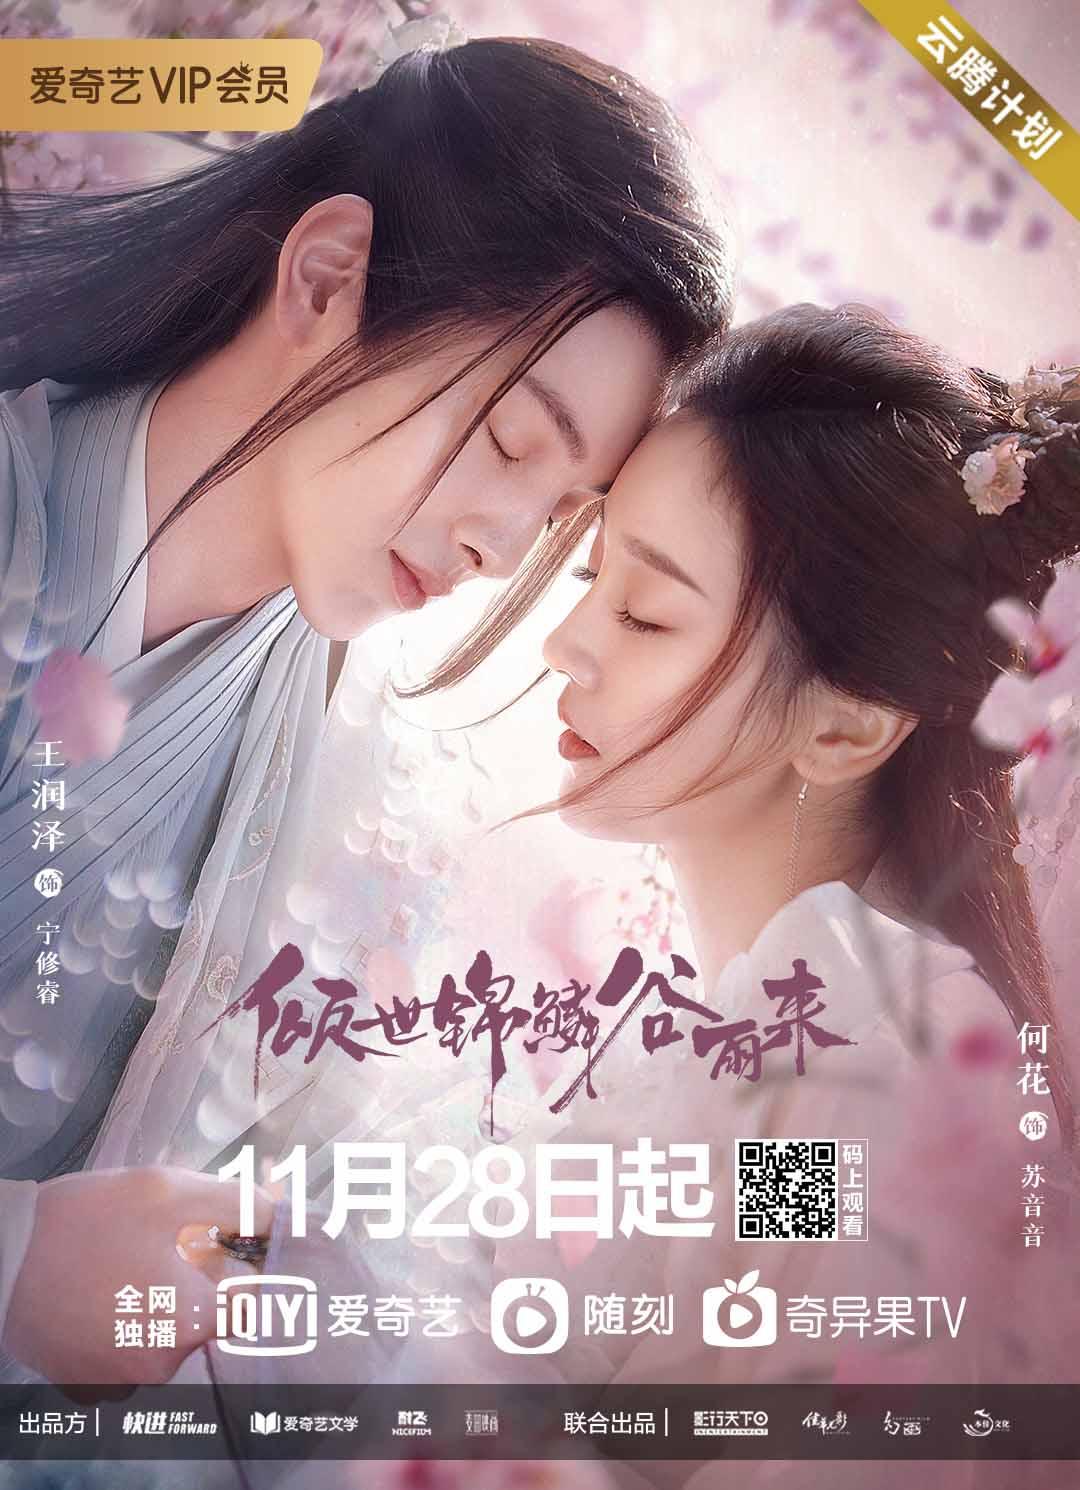 Khuynh Thế Cẩm Lân Cốc Vũ Lai - Eternal Love Rain